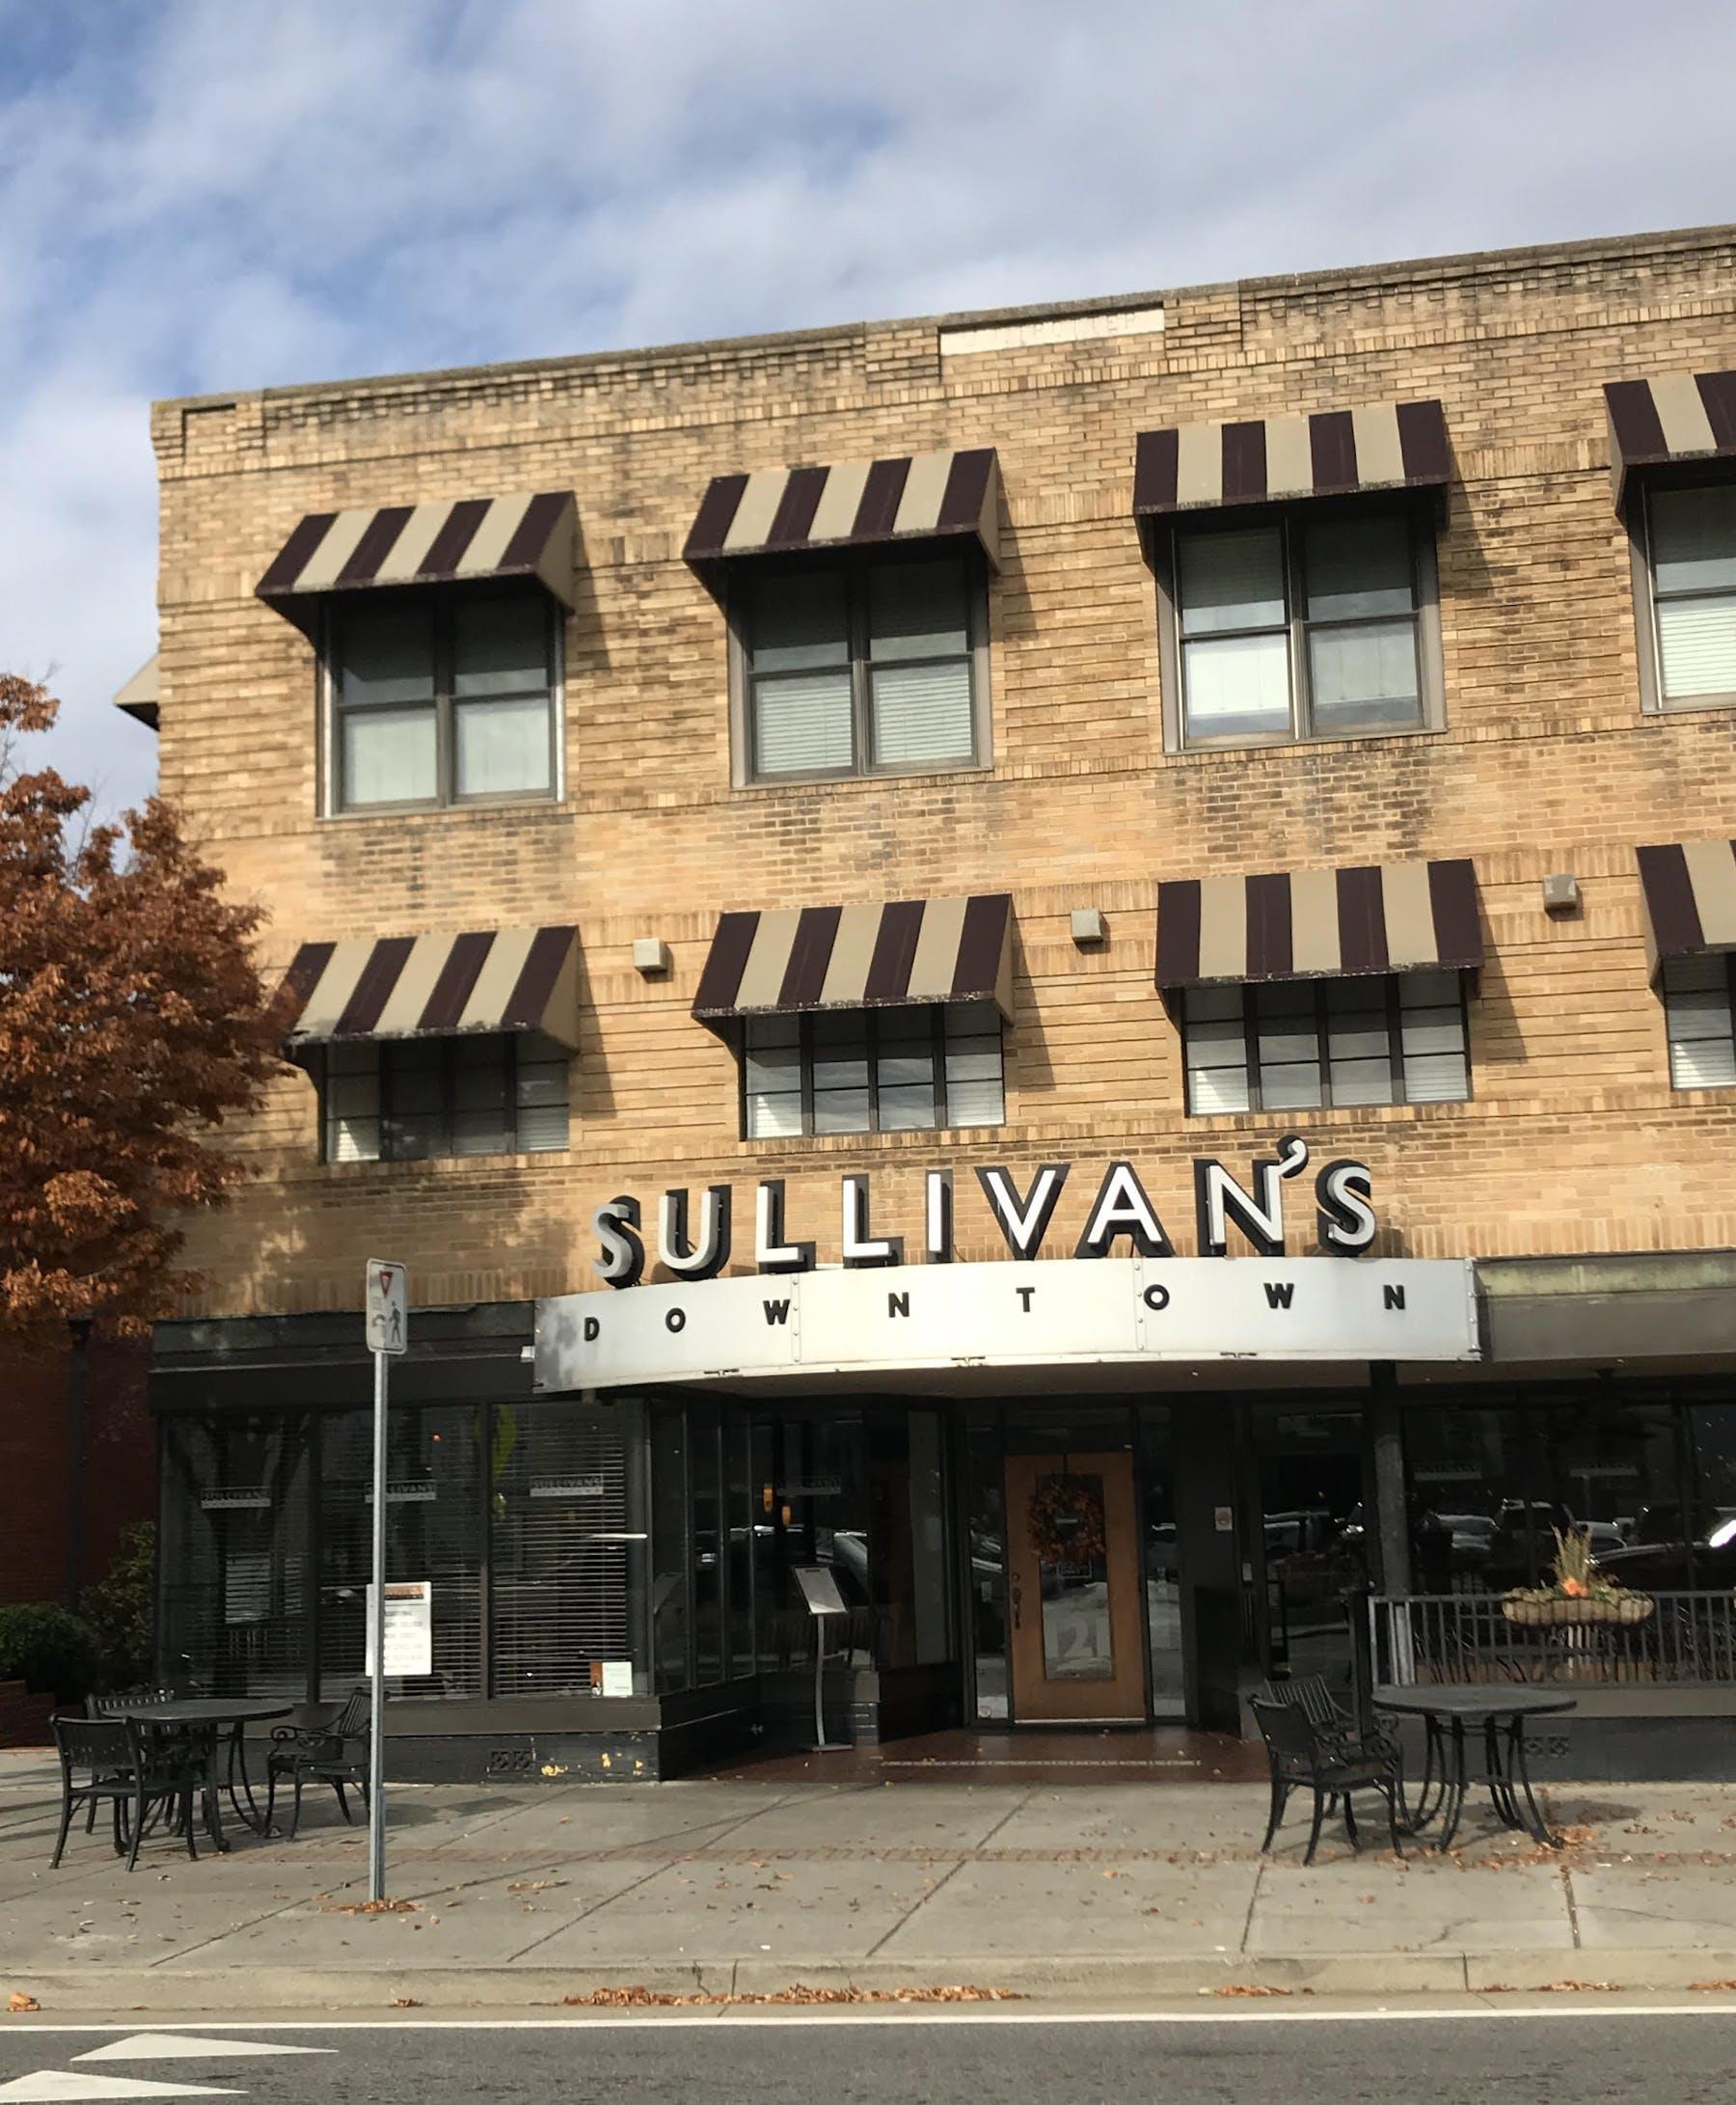 sullivan's restaurant building